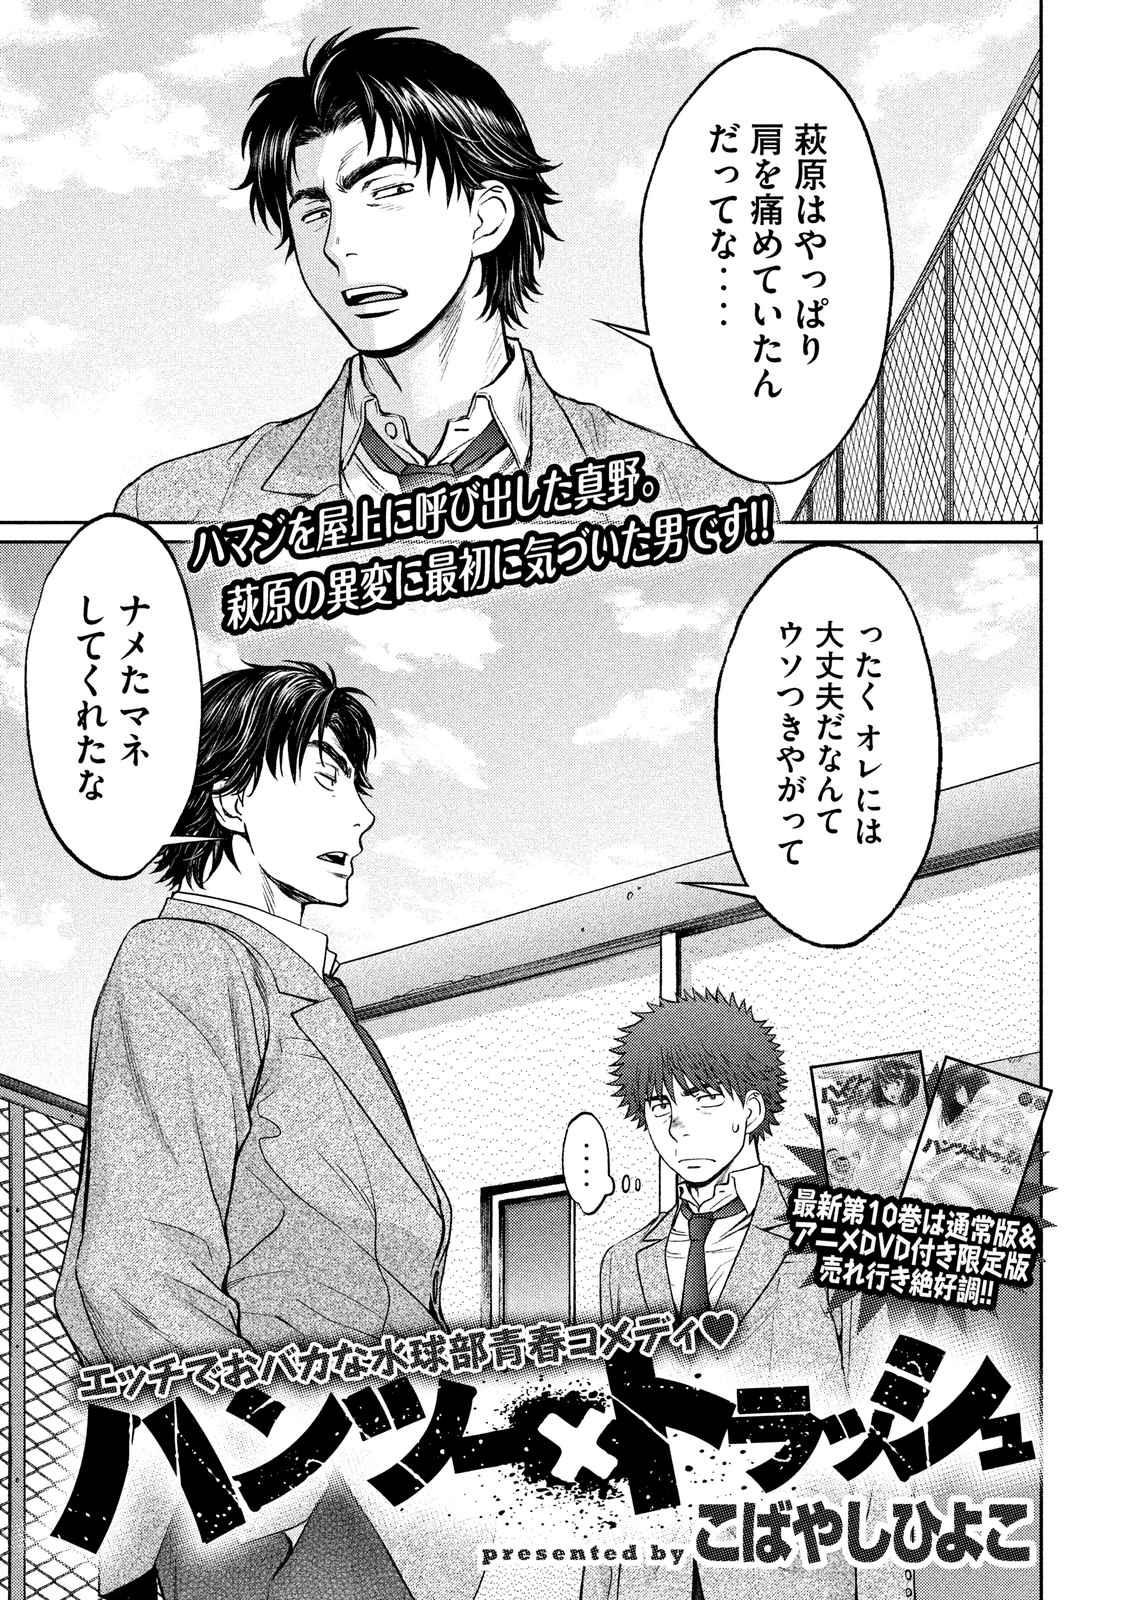 Hantsu_x_Trash Chapter 117 Page 1